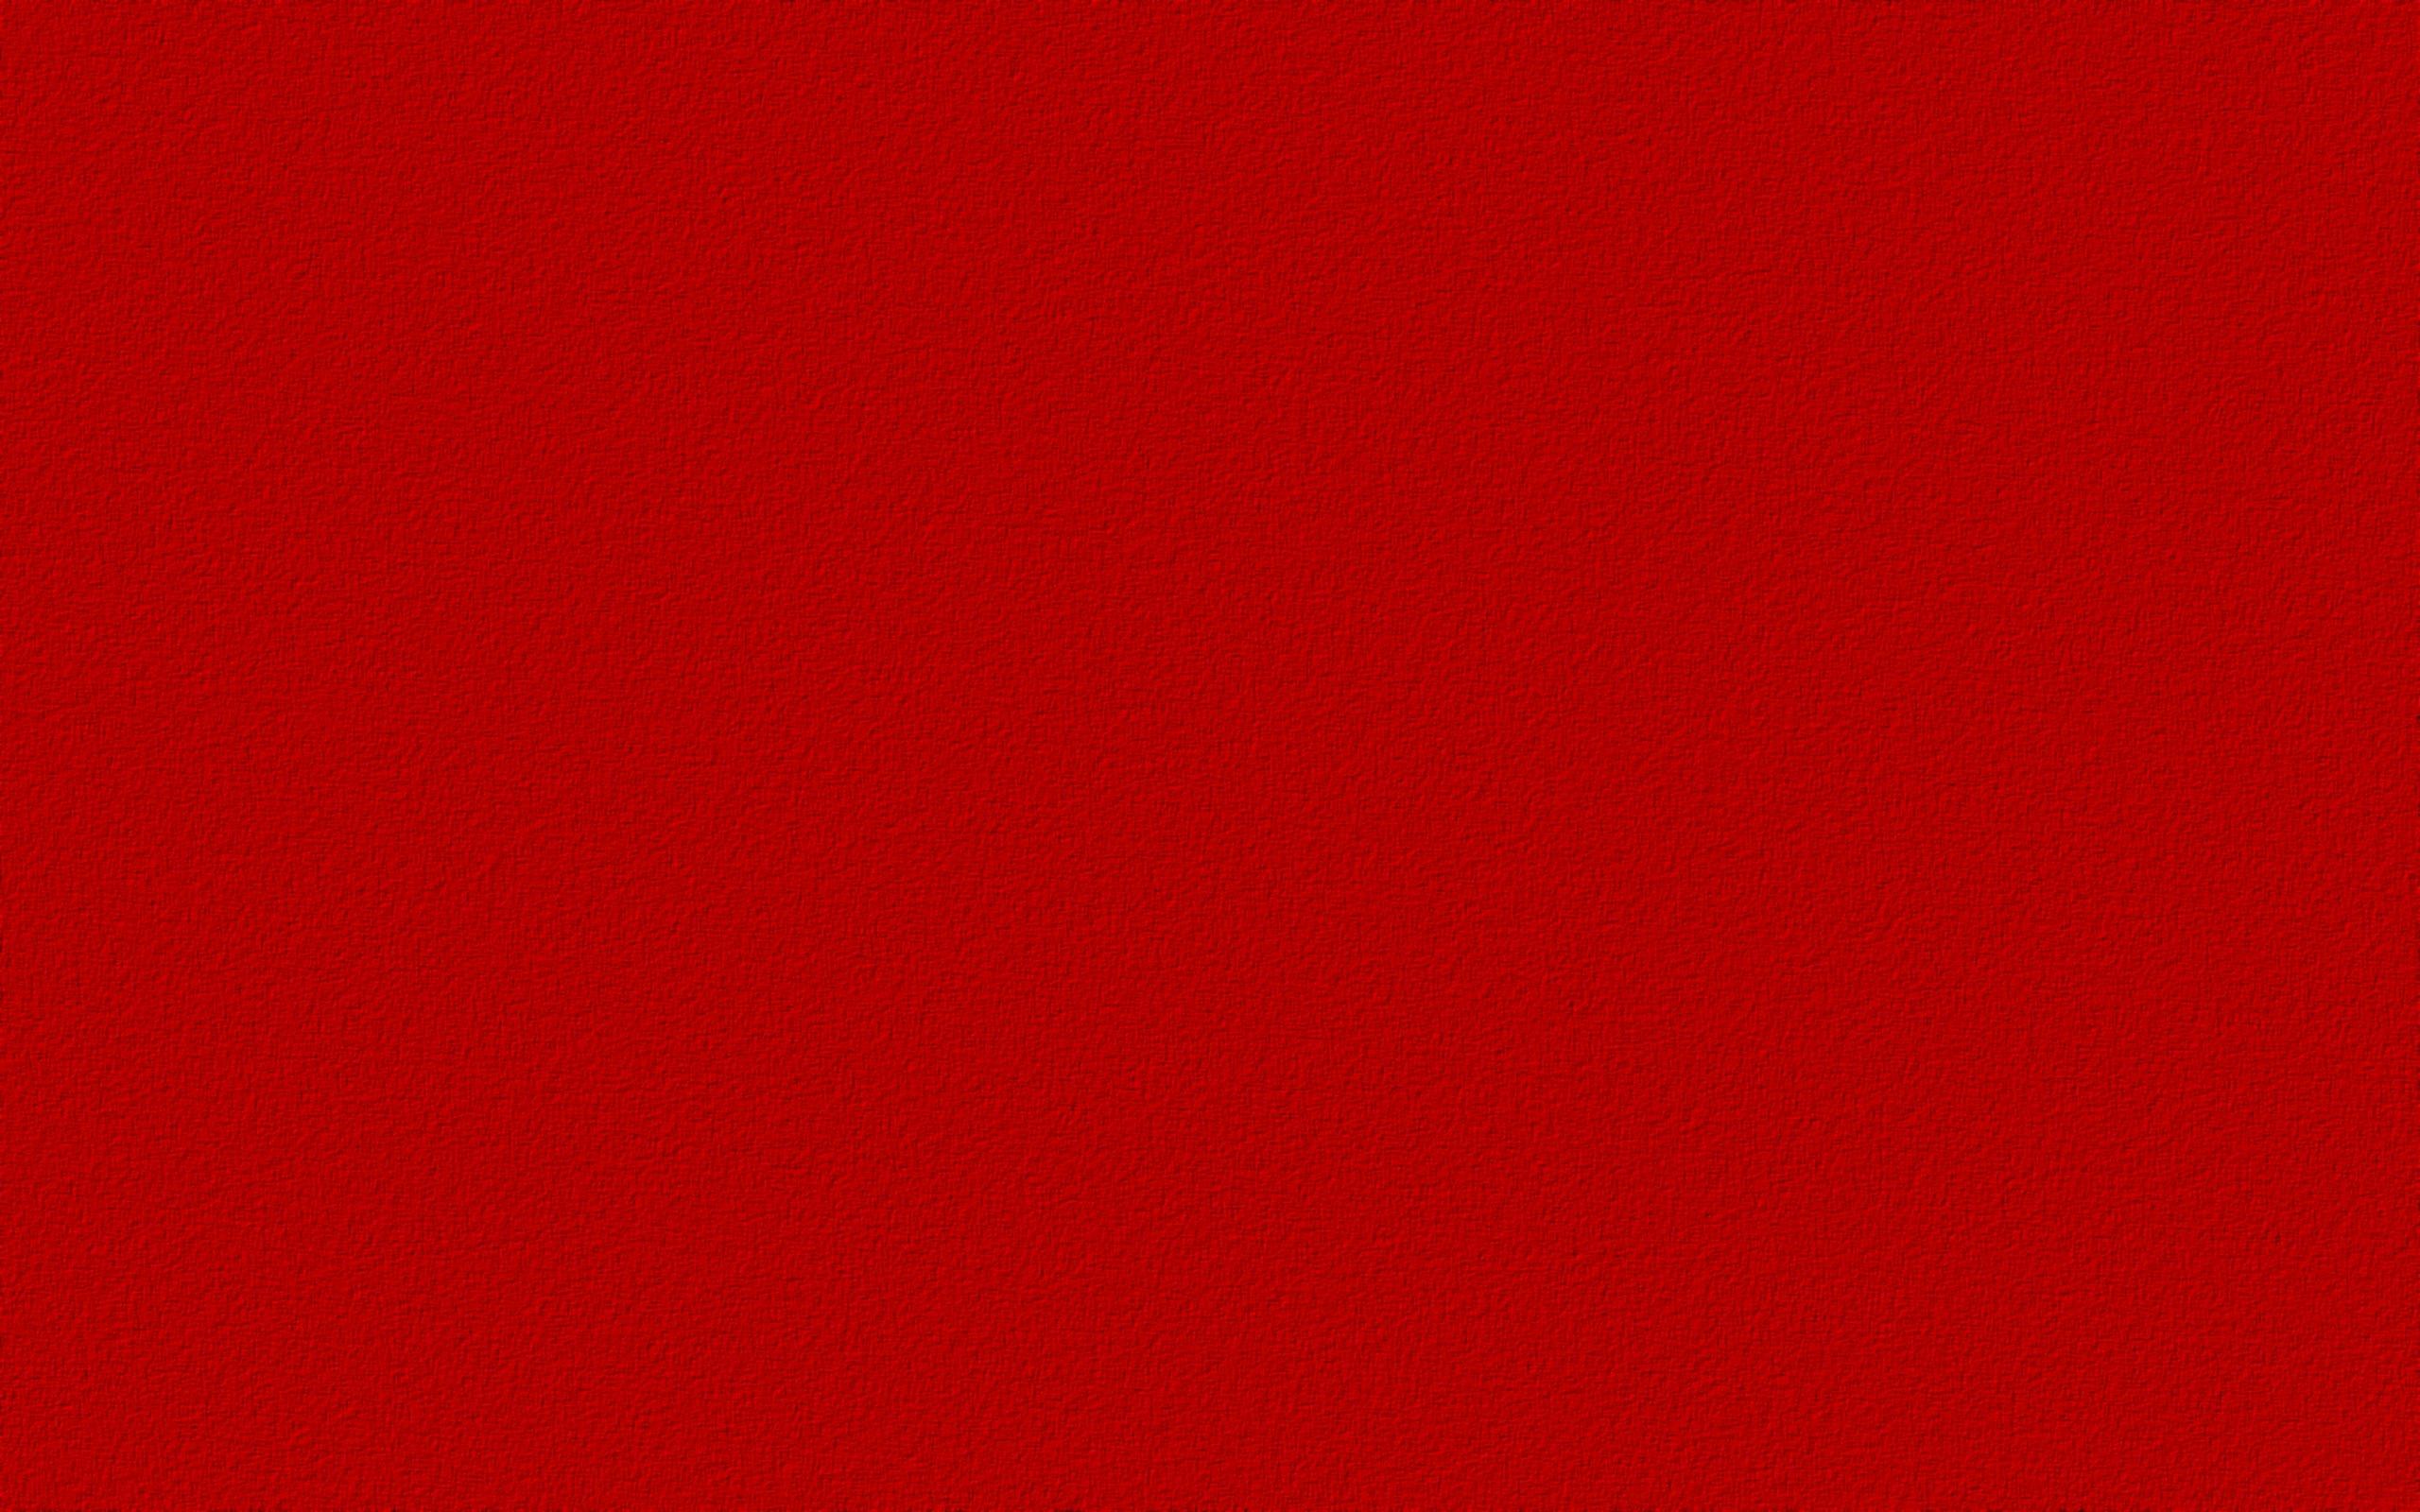 Red 2142 2560 x 1600   WallpaperLayercom 2560x1600